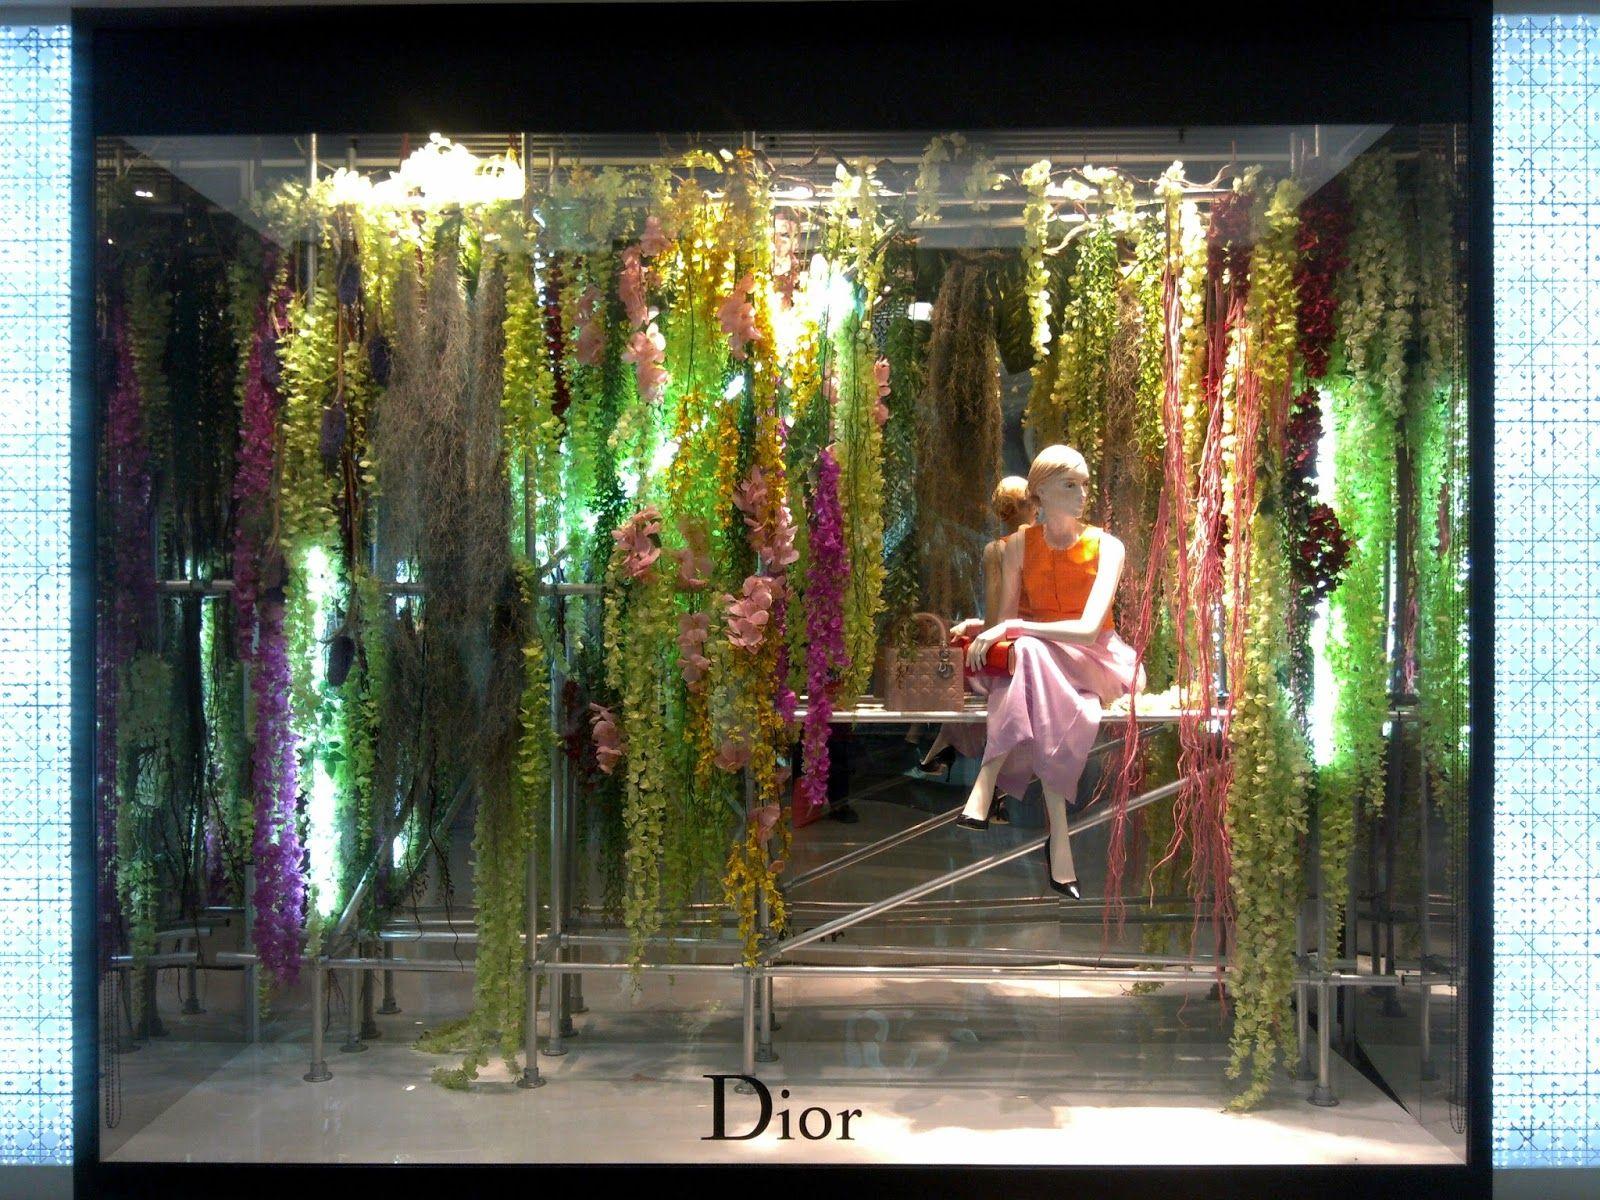 dior - indonesia...displayhunter2